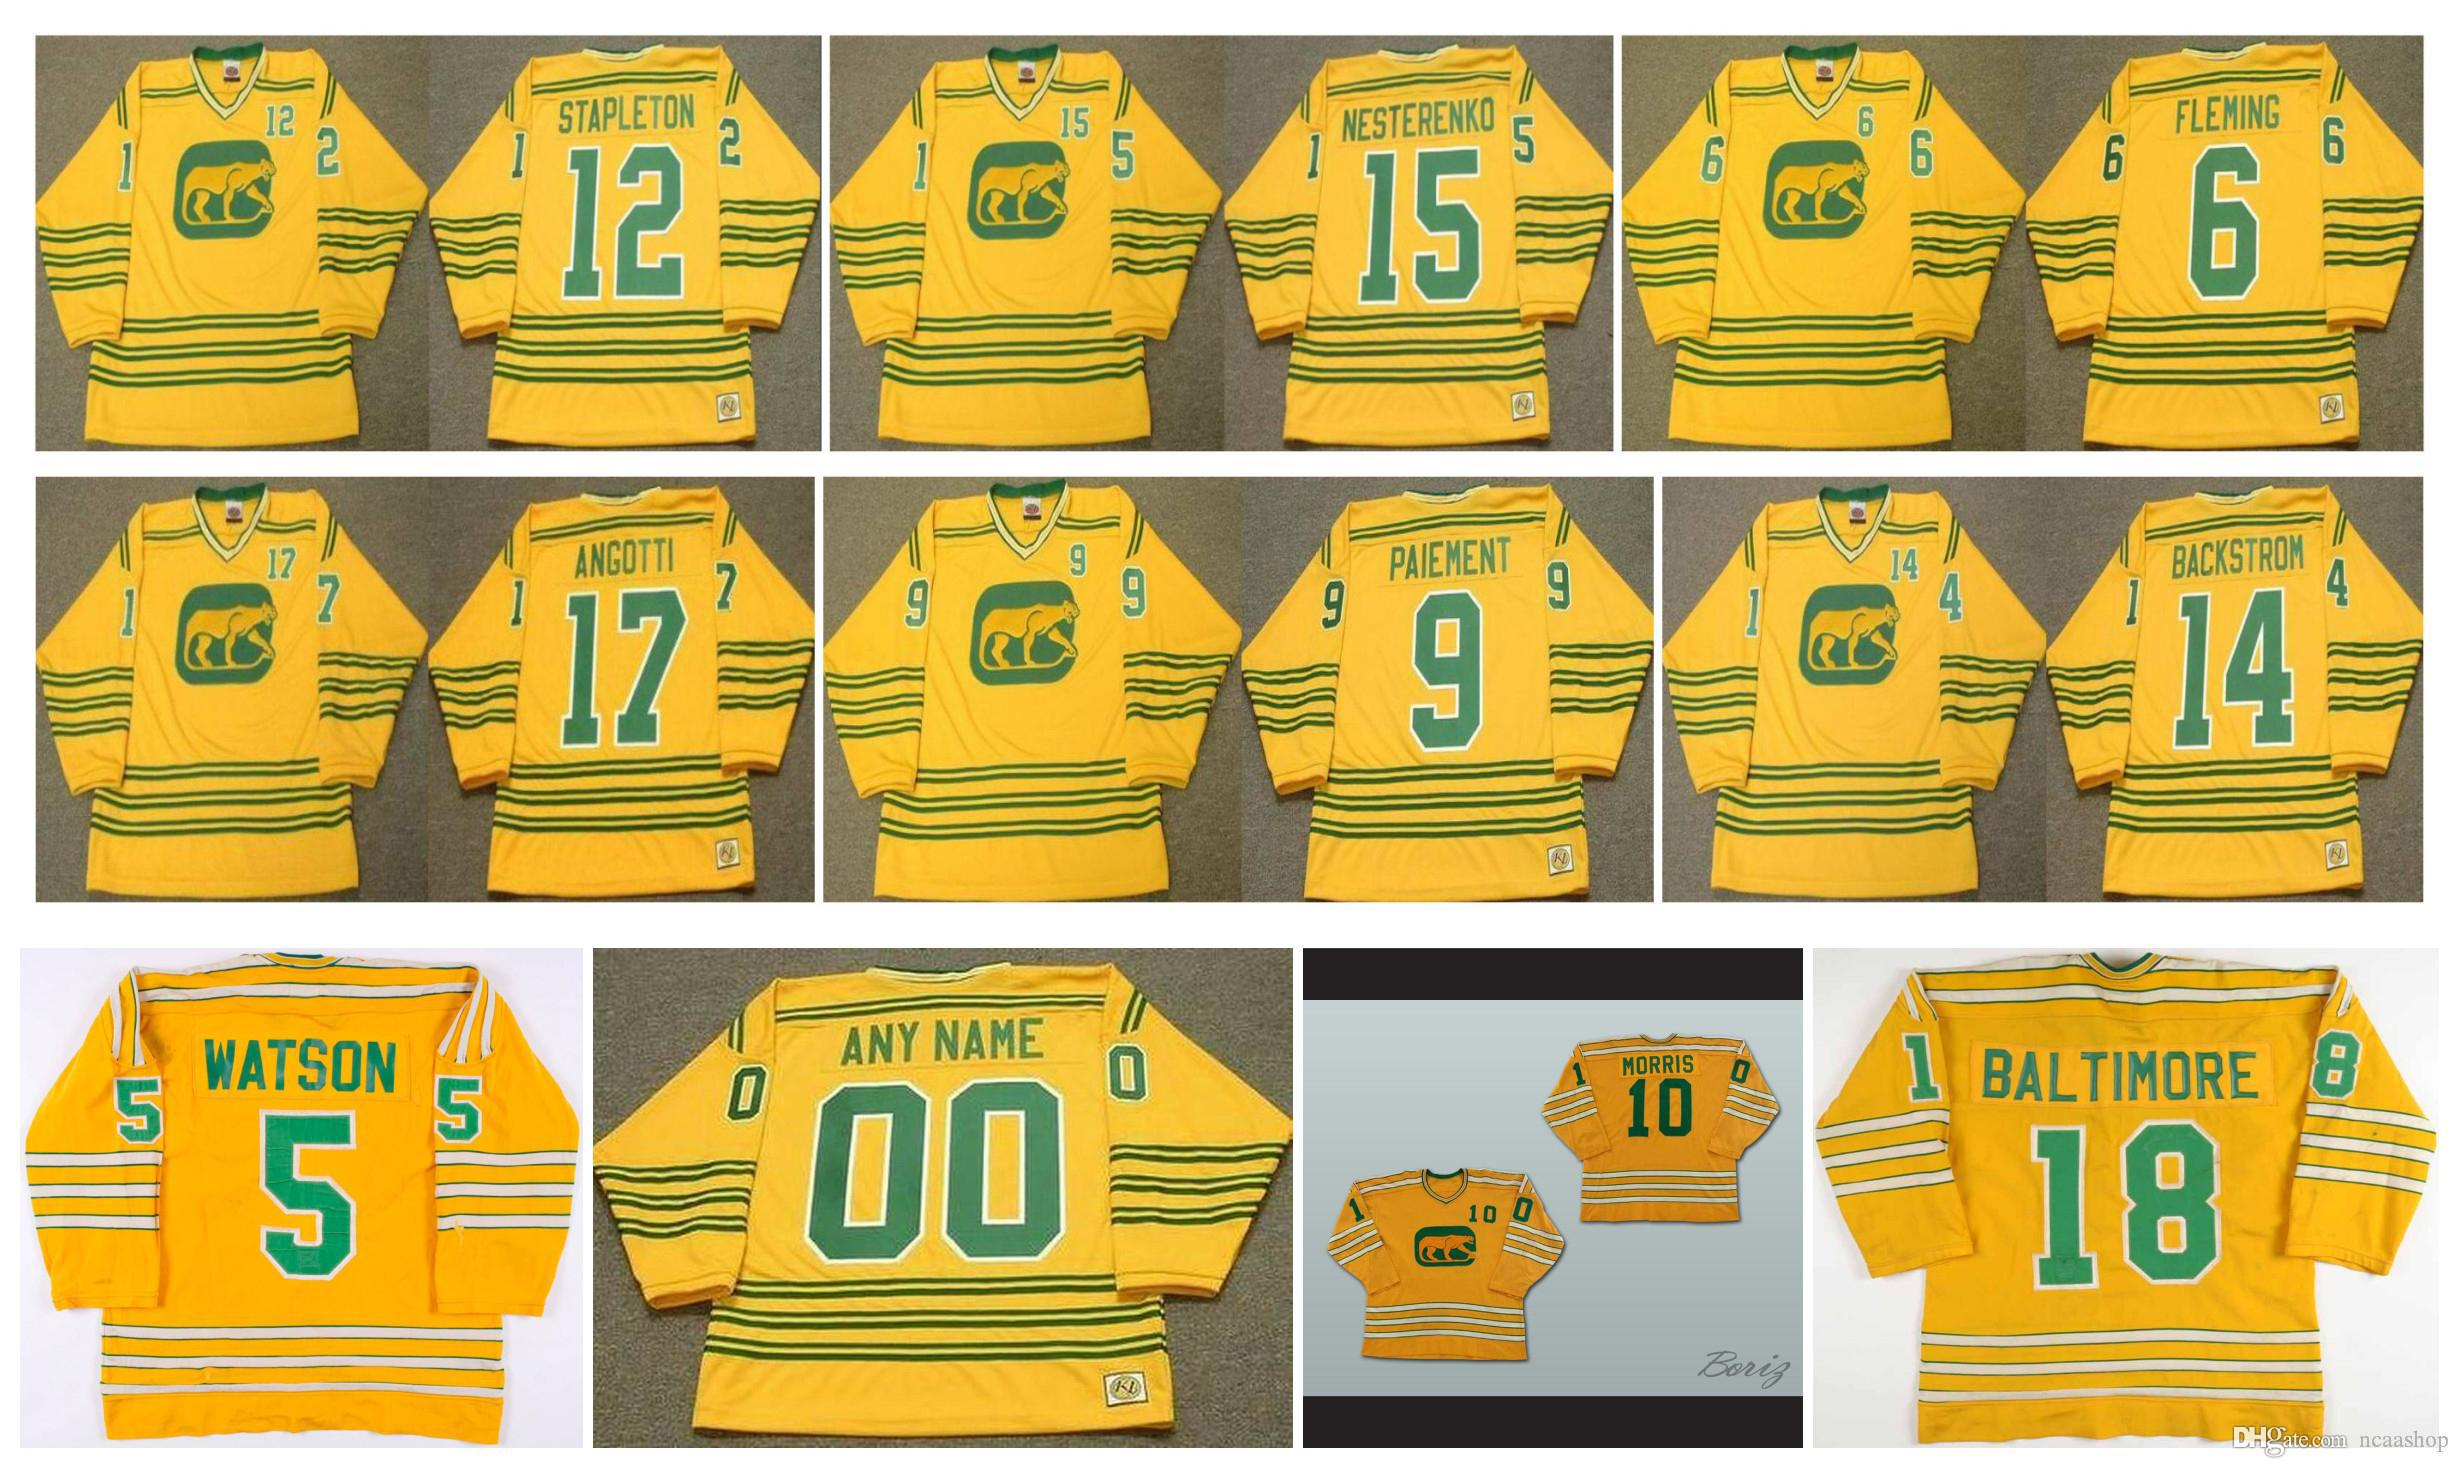 Vintage Chicago Cougars Trikot 6 REGGIE FLEMING 12 PAT STAPLETON 17 LOU ANGOTTI 15 ERIC NESTERENKO 14 Ralph Backstrom Gelb Retro Hockey